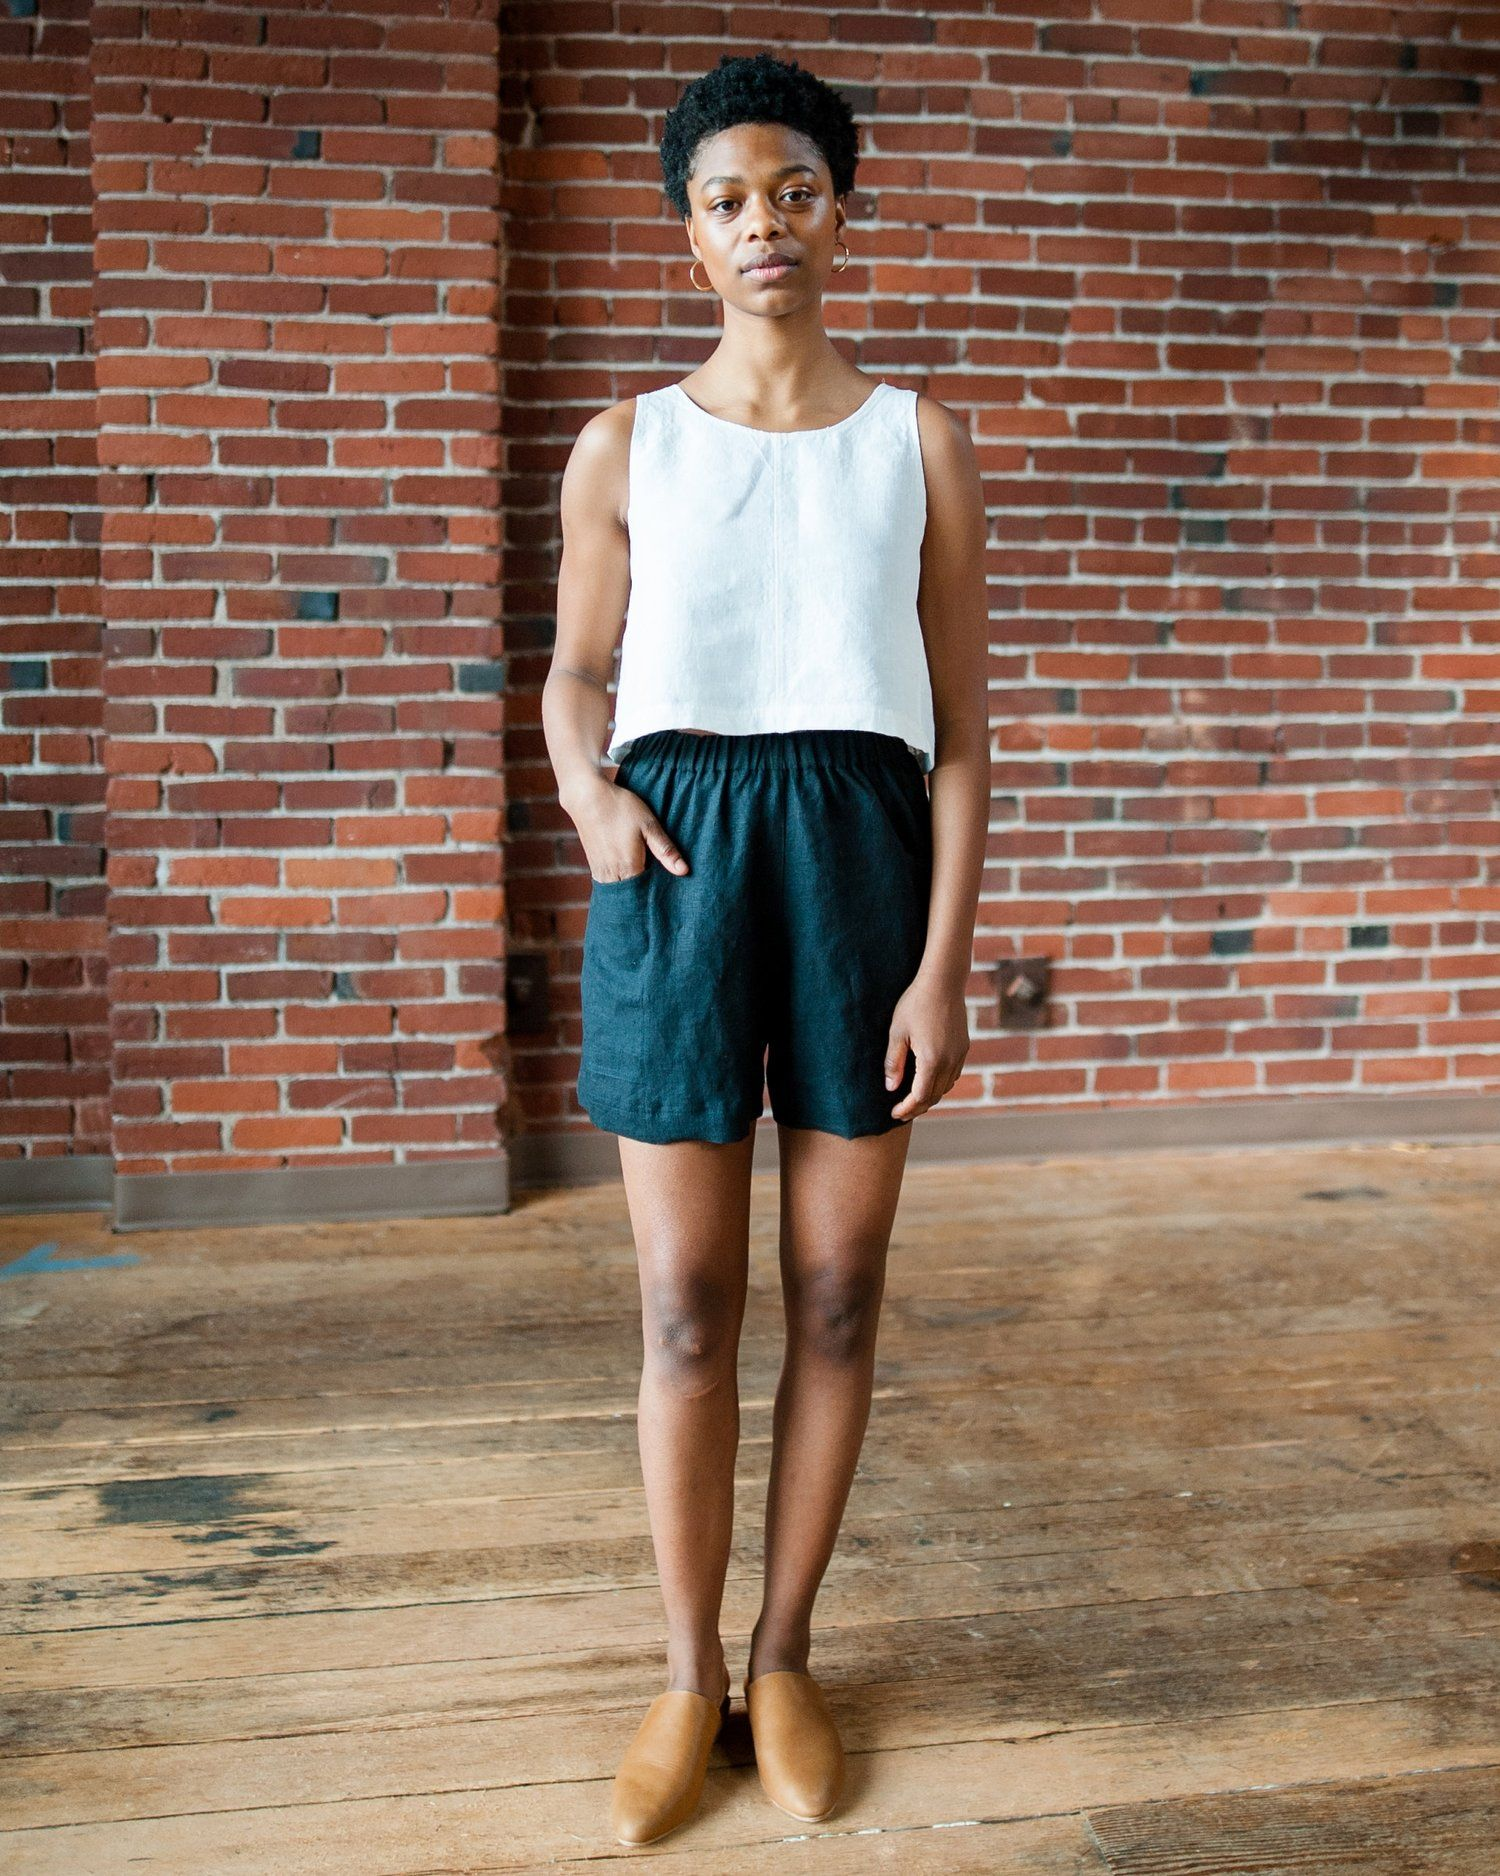 Uniform Short - Linen | Short dresses, Fashion, Linen shorts